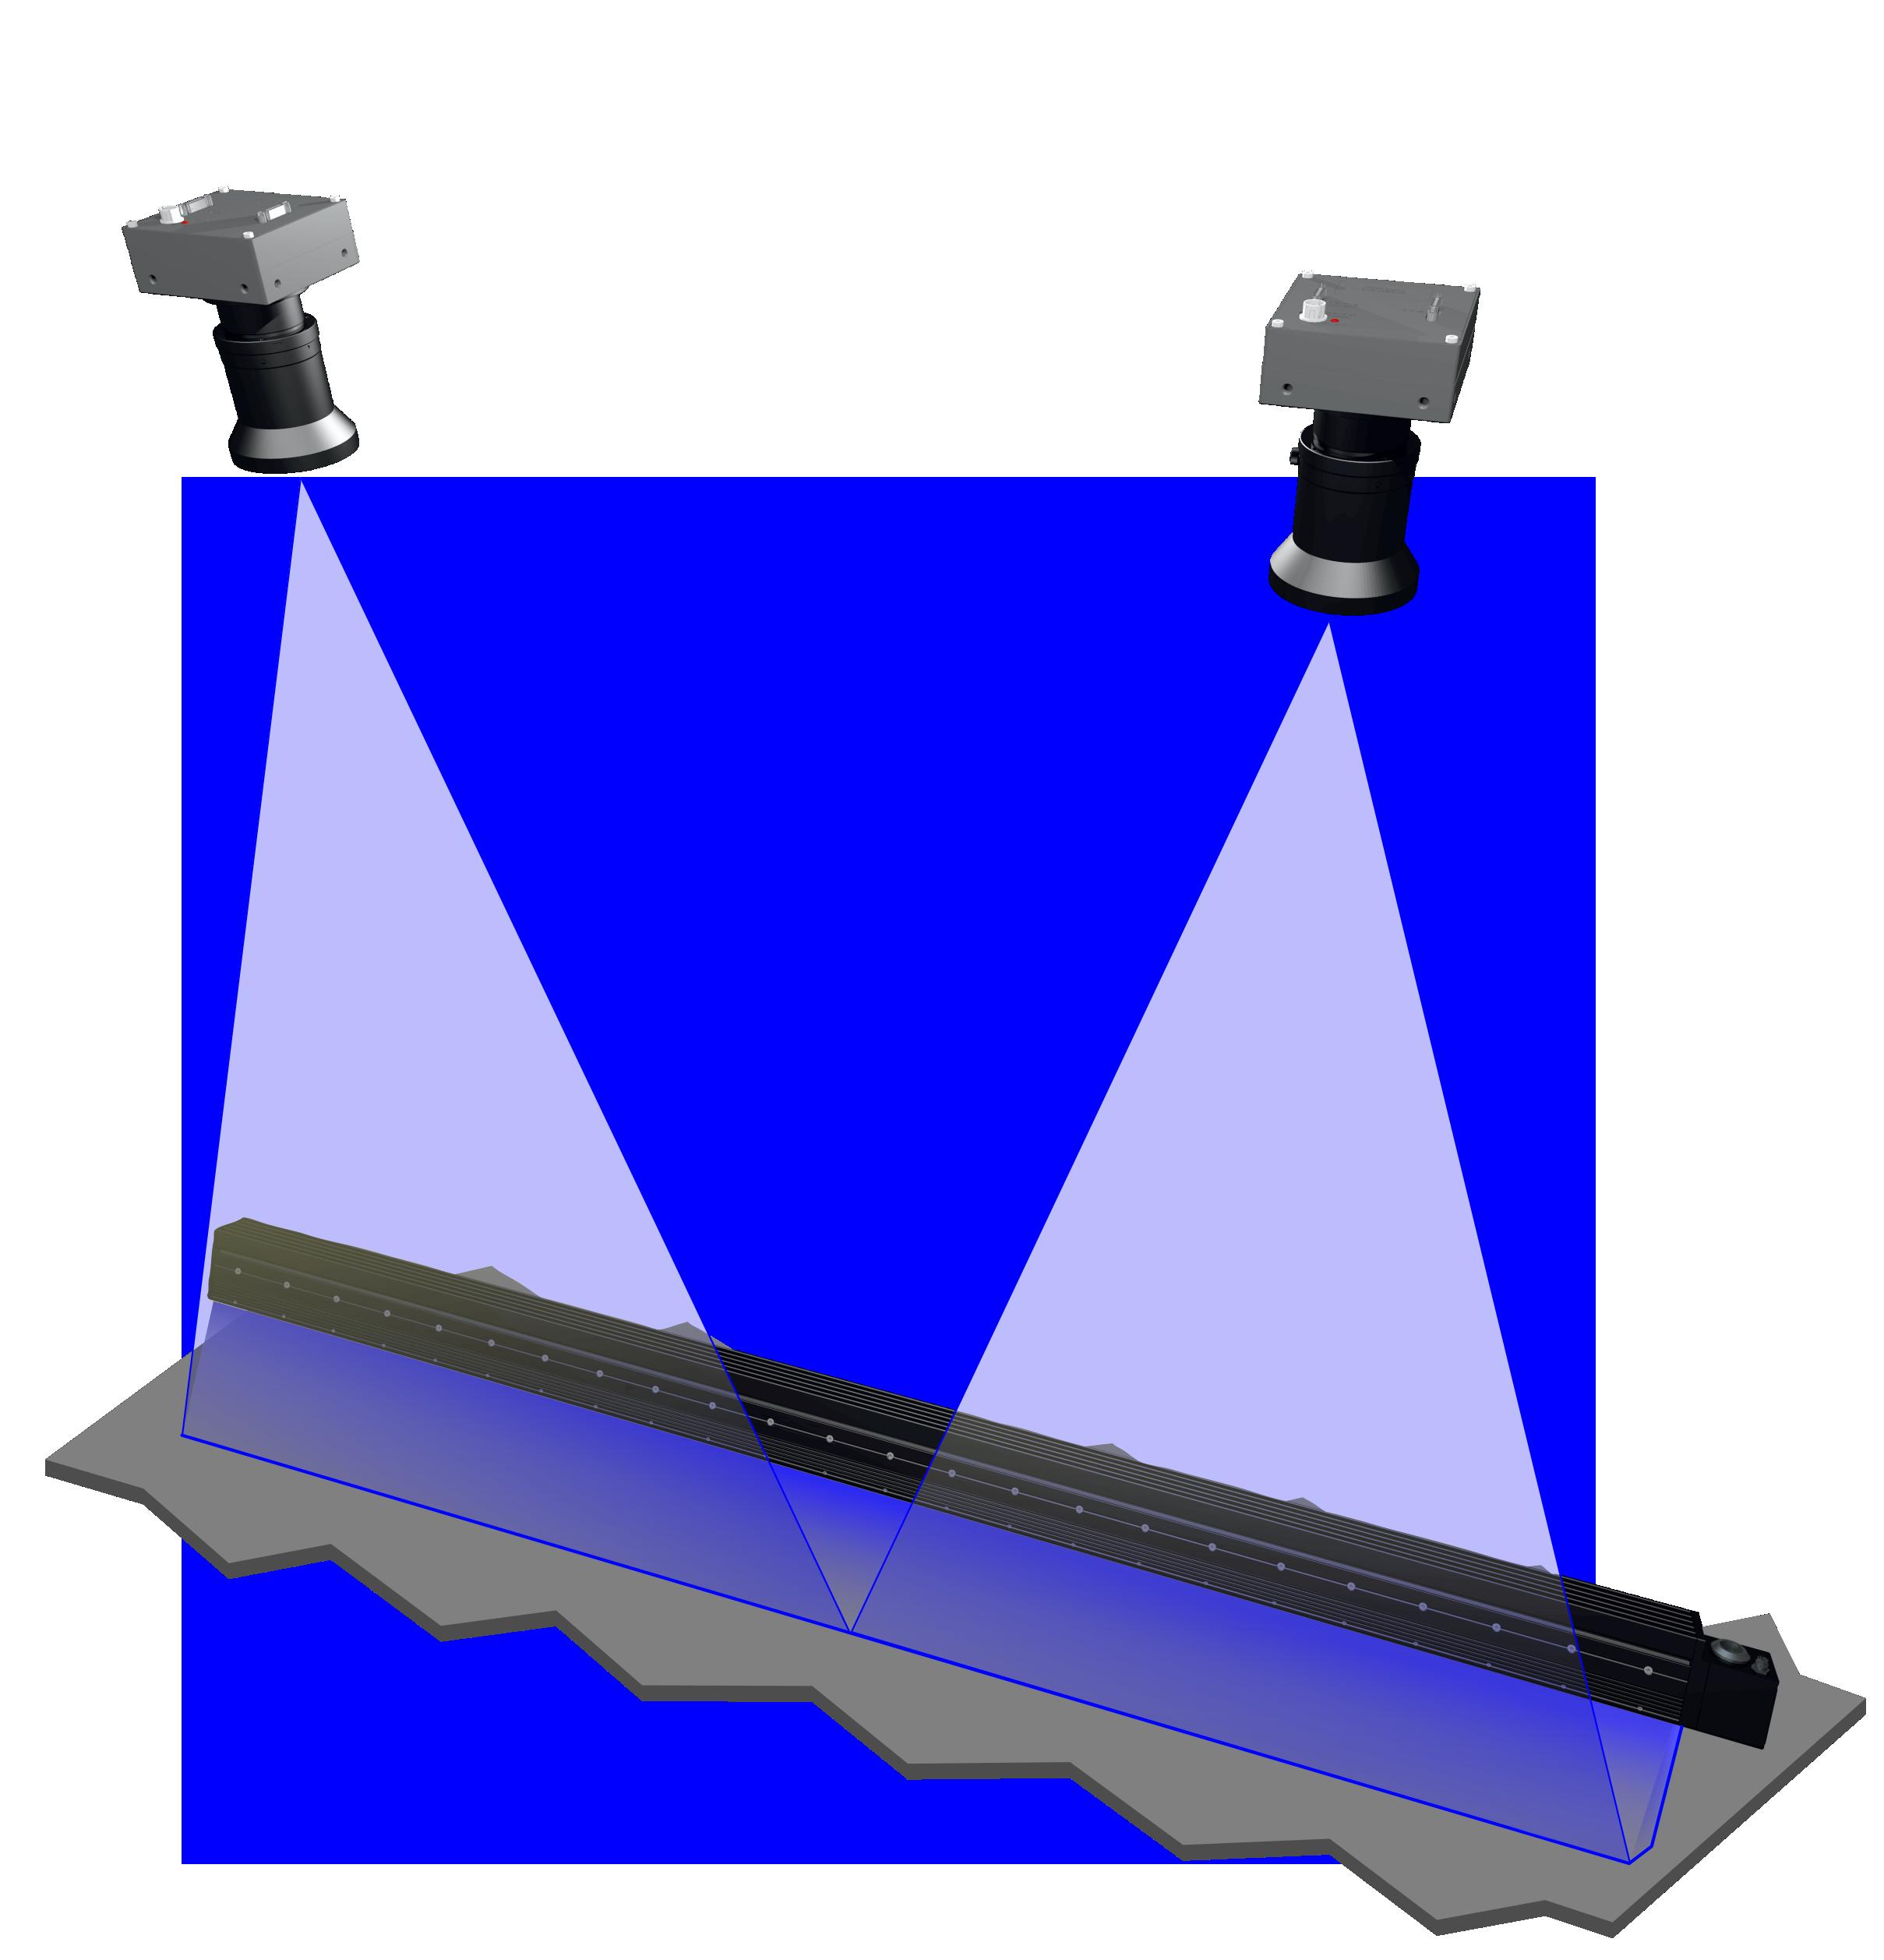 Un optimized LED based illumination requiring close projection distance